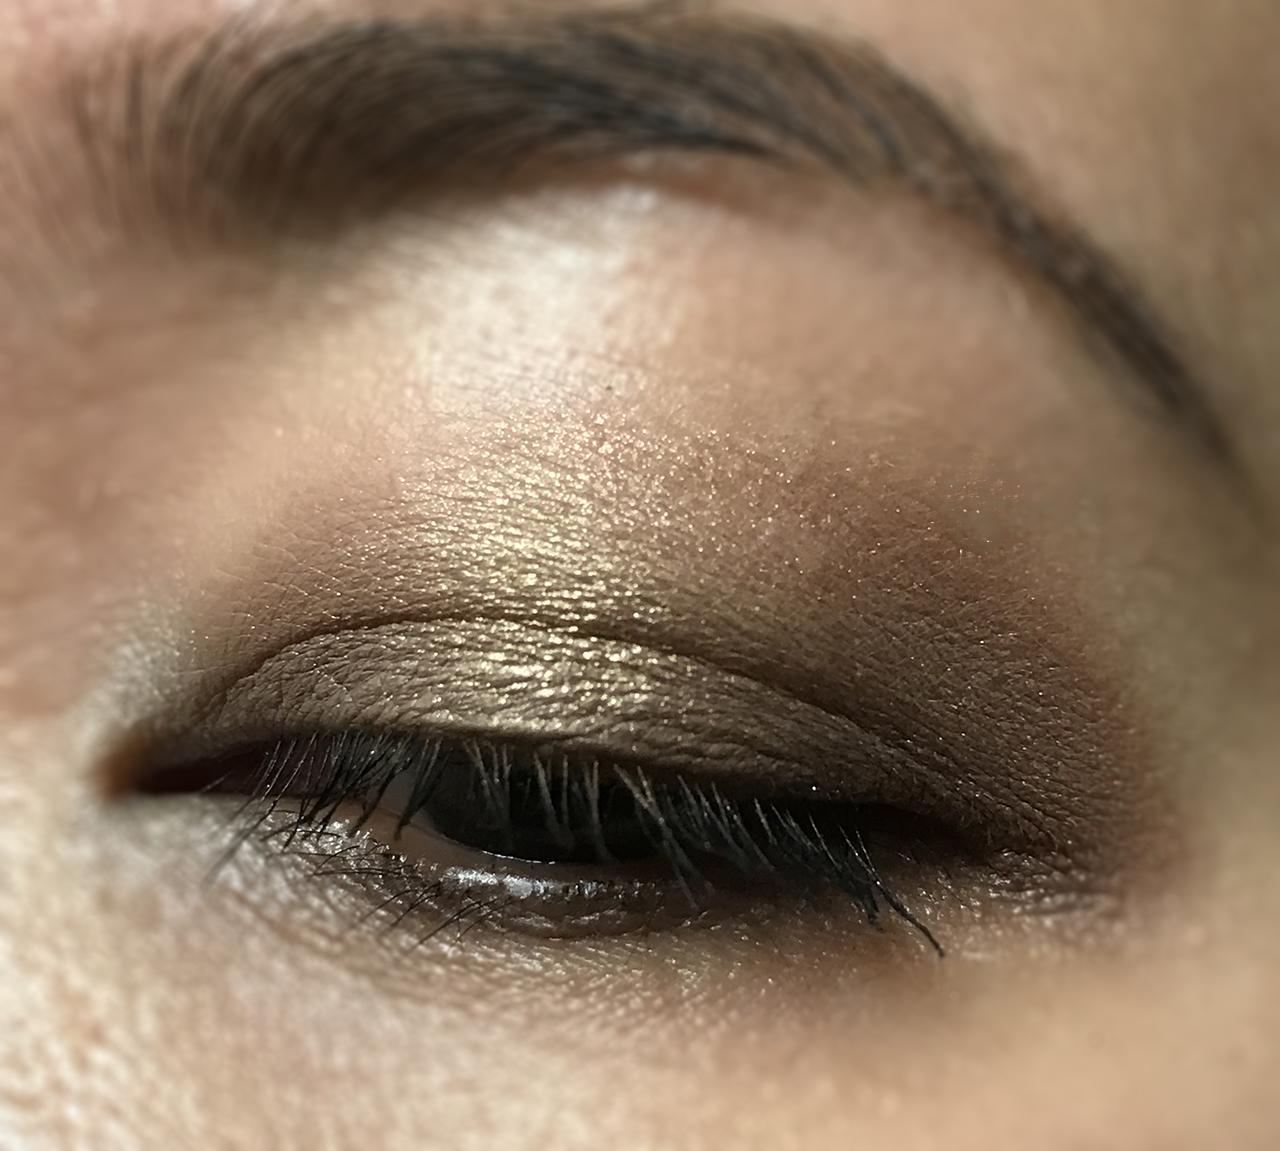 Zoeva The Basic Moment Eyeshadow Palette eye makeup look 2